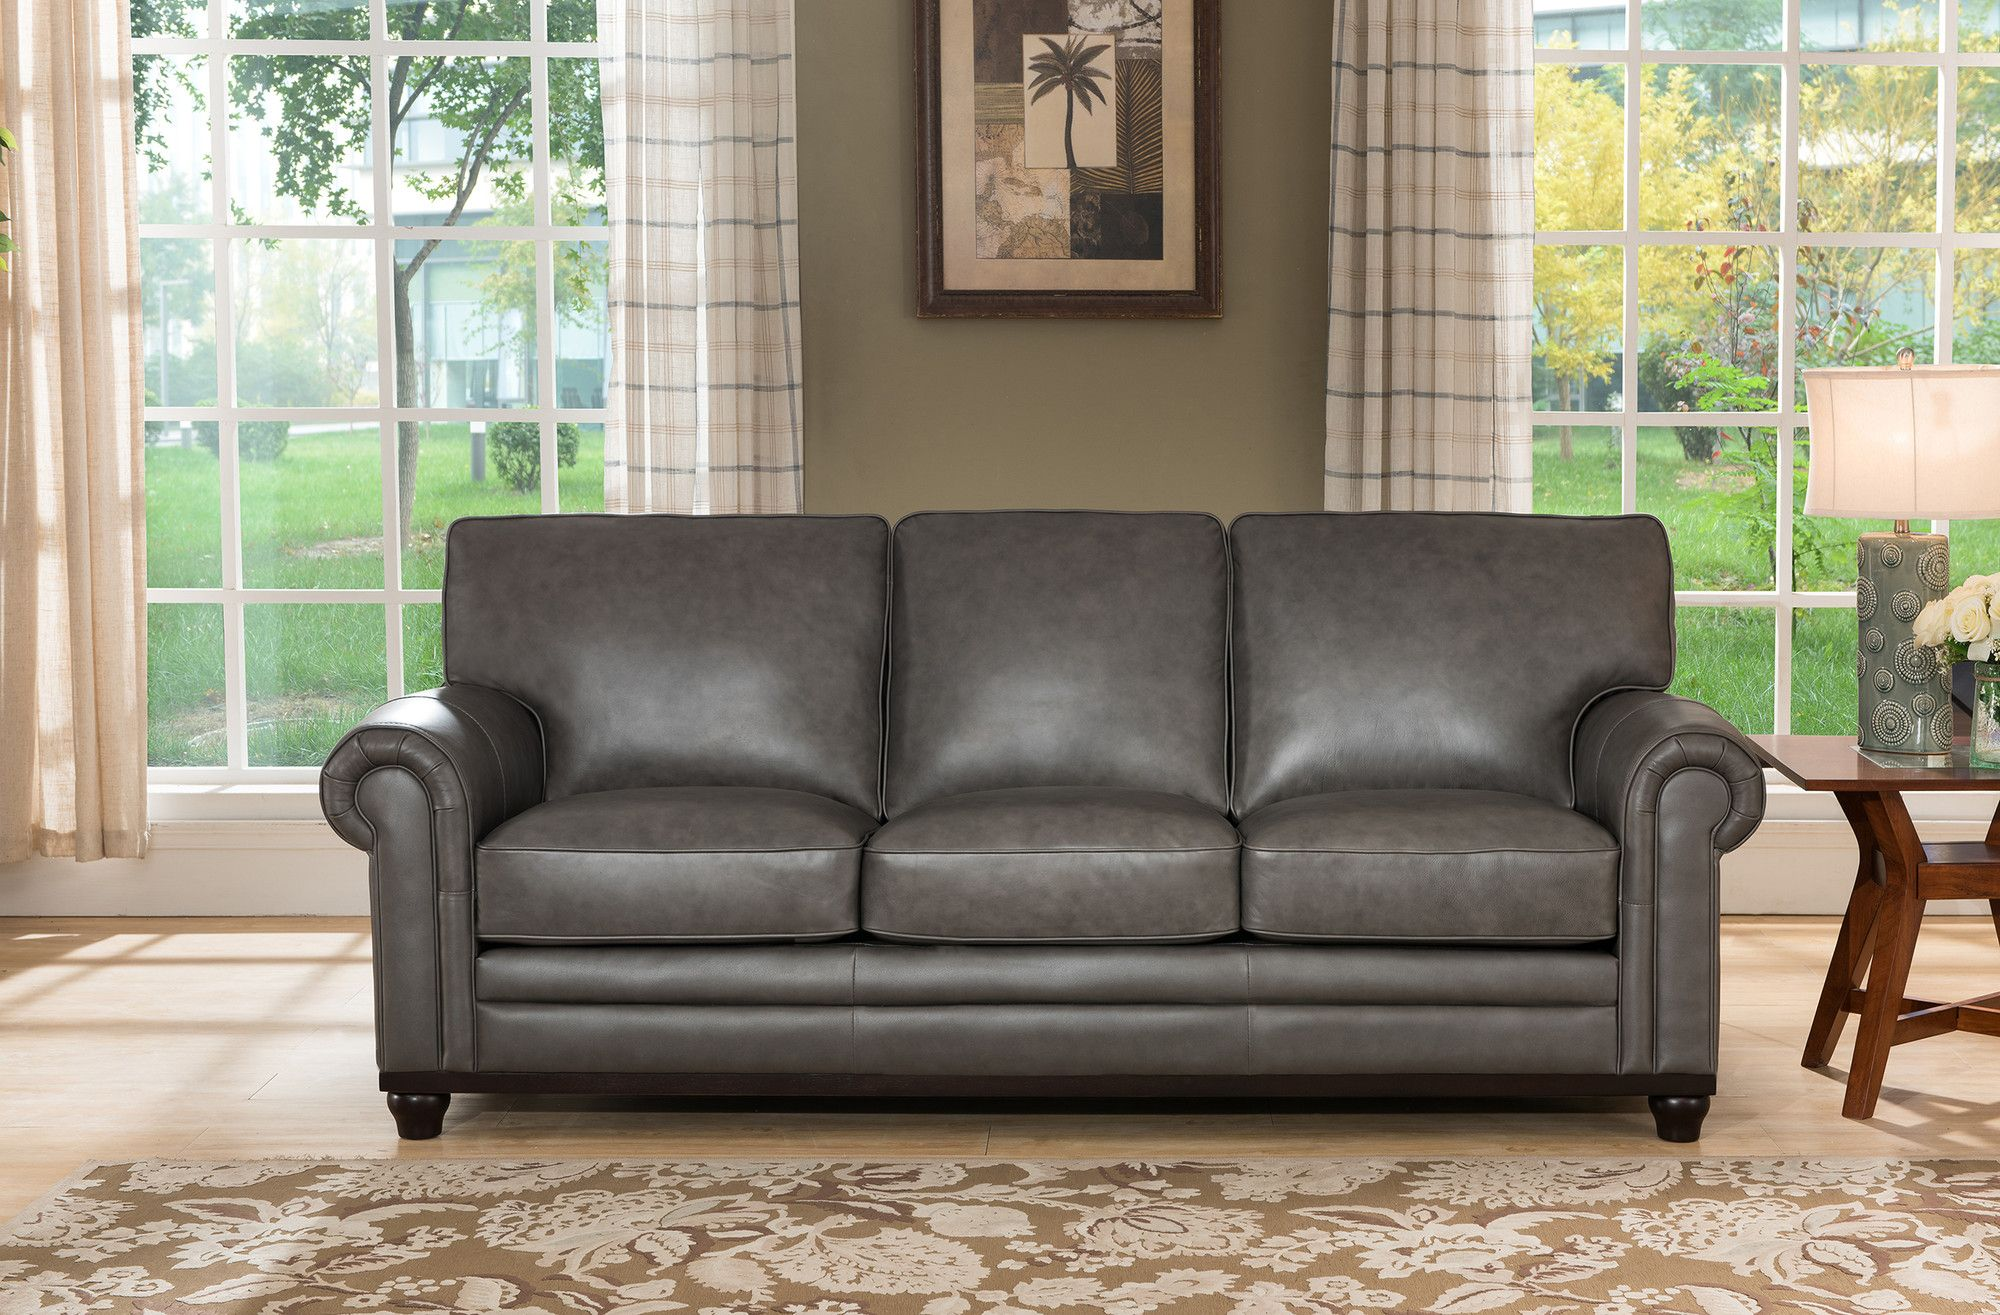 Stafford Top Grain Leather Sofa